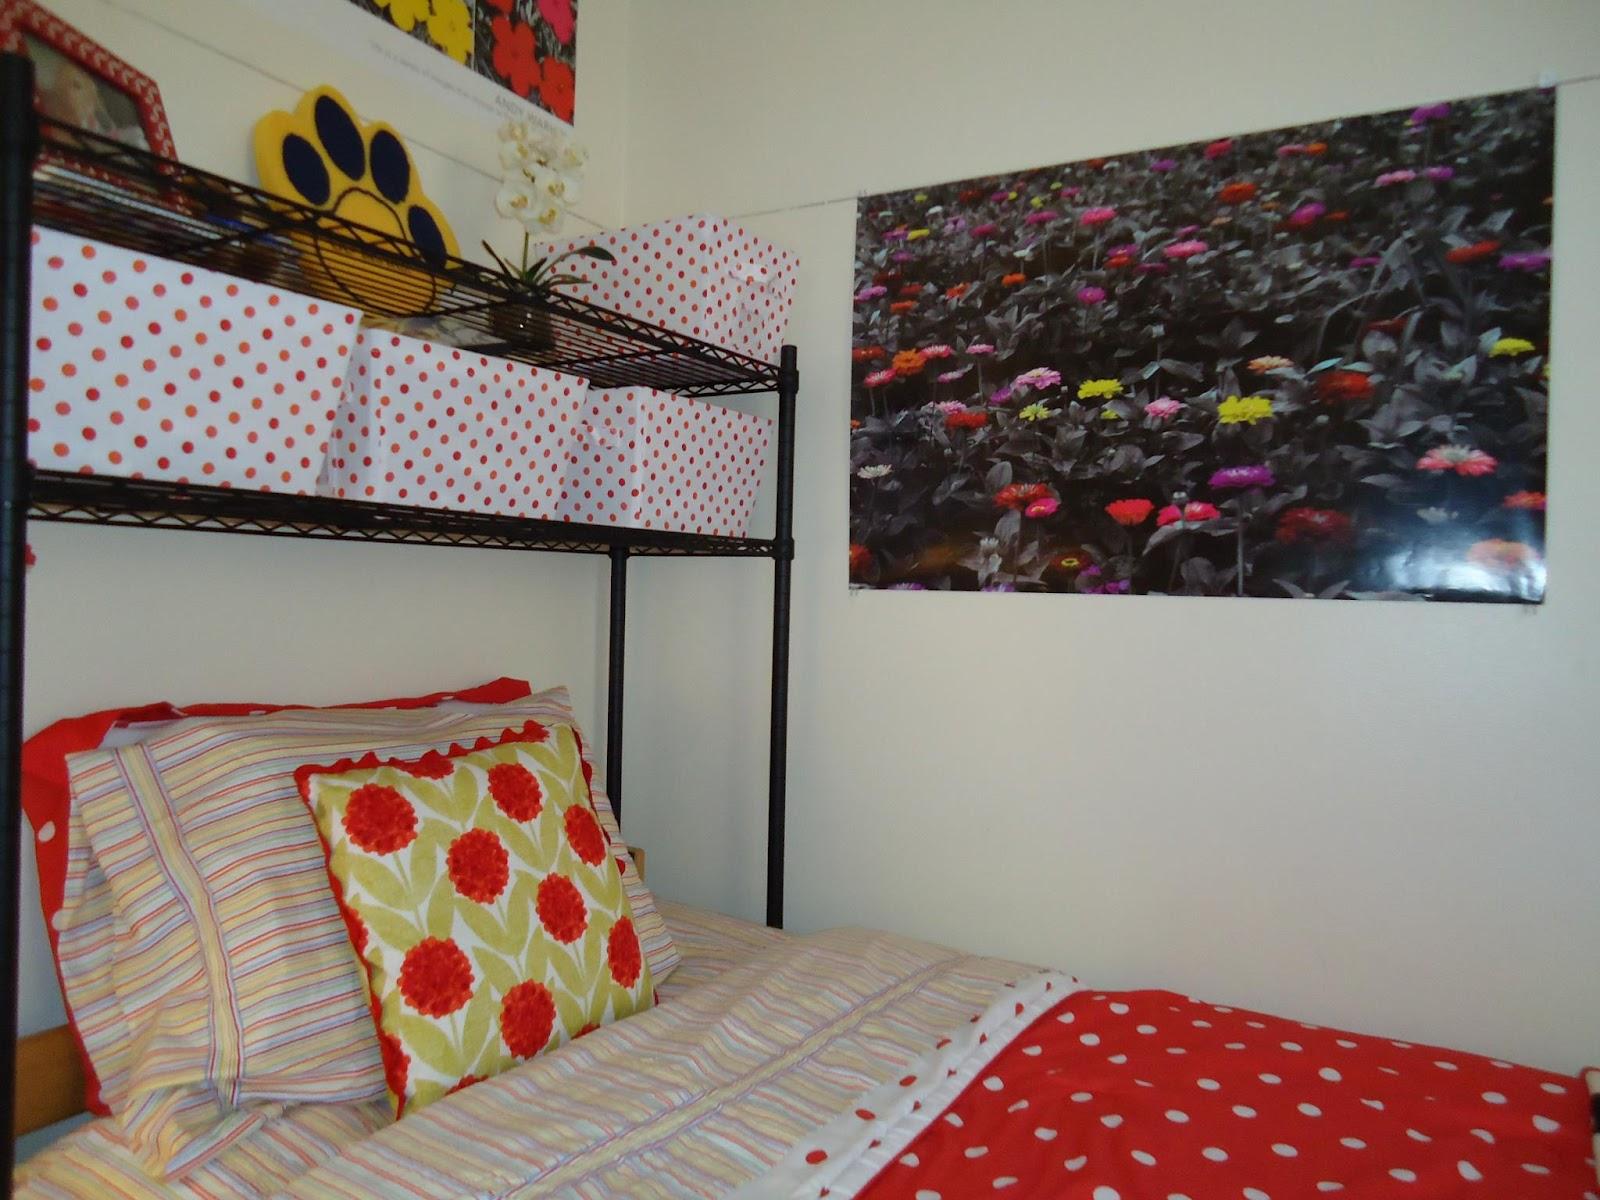 Caitiebug Love Dorm Room Storage & College Dorm Storage Bins - Listitdallas